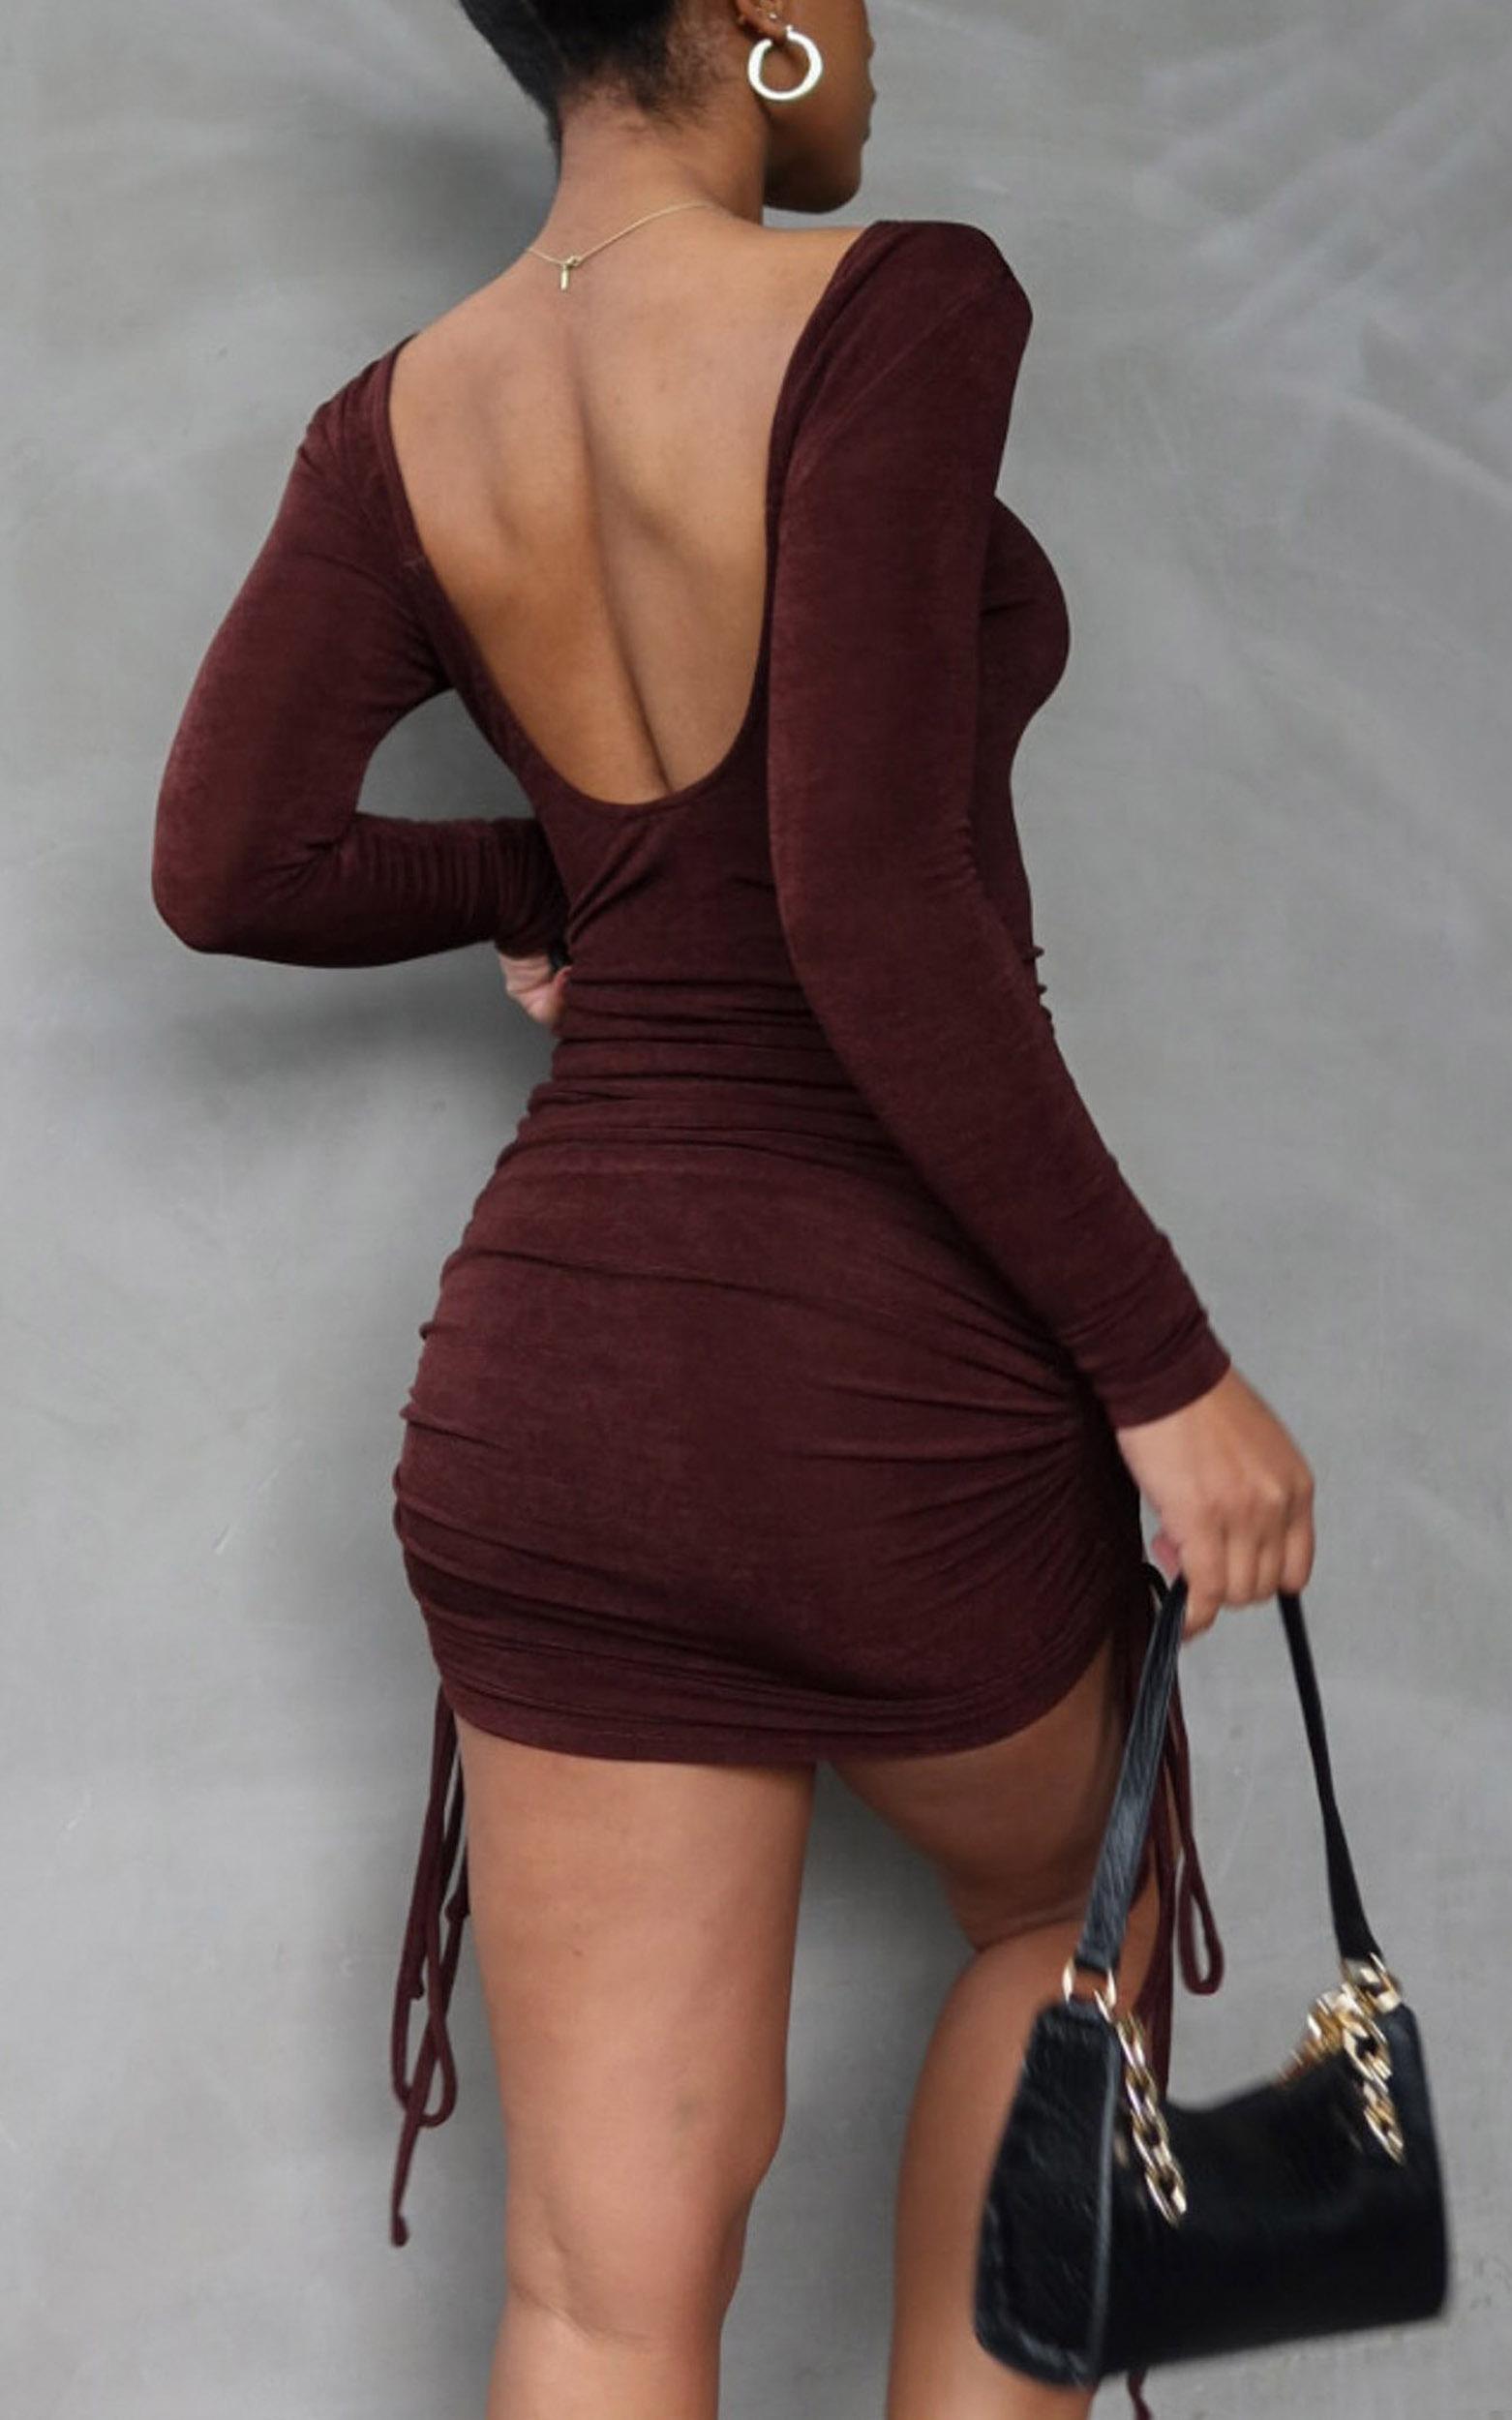 Fernanda Open Scoop Back Dress in Chocolate - 06, BRN2, hi-res image number null